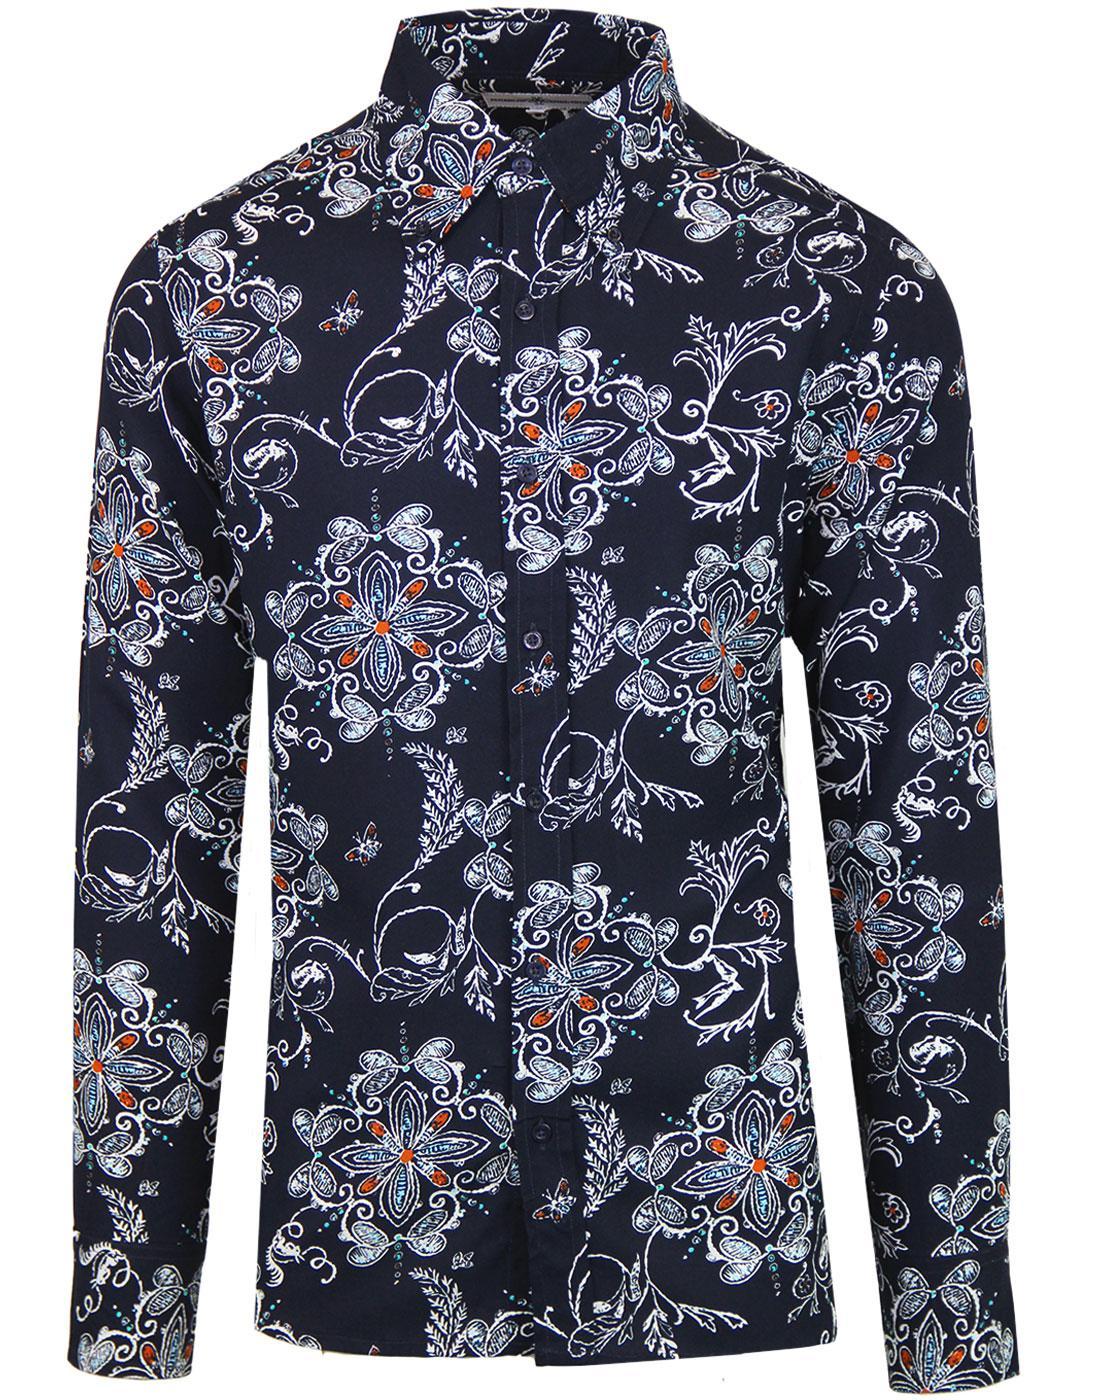 madcap england garageflower mod rayon floral shirt